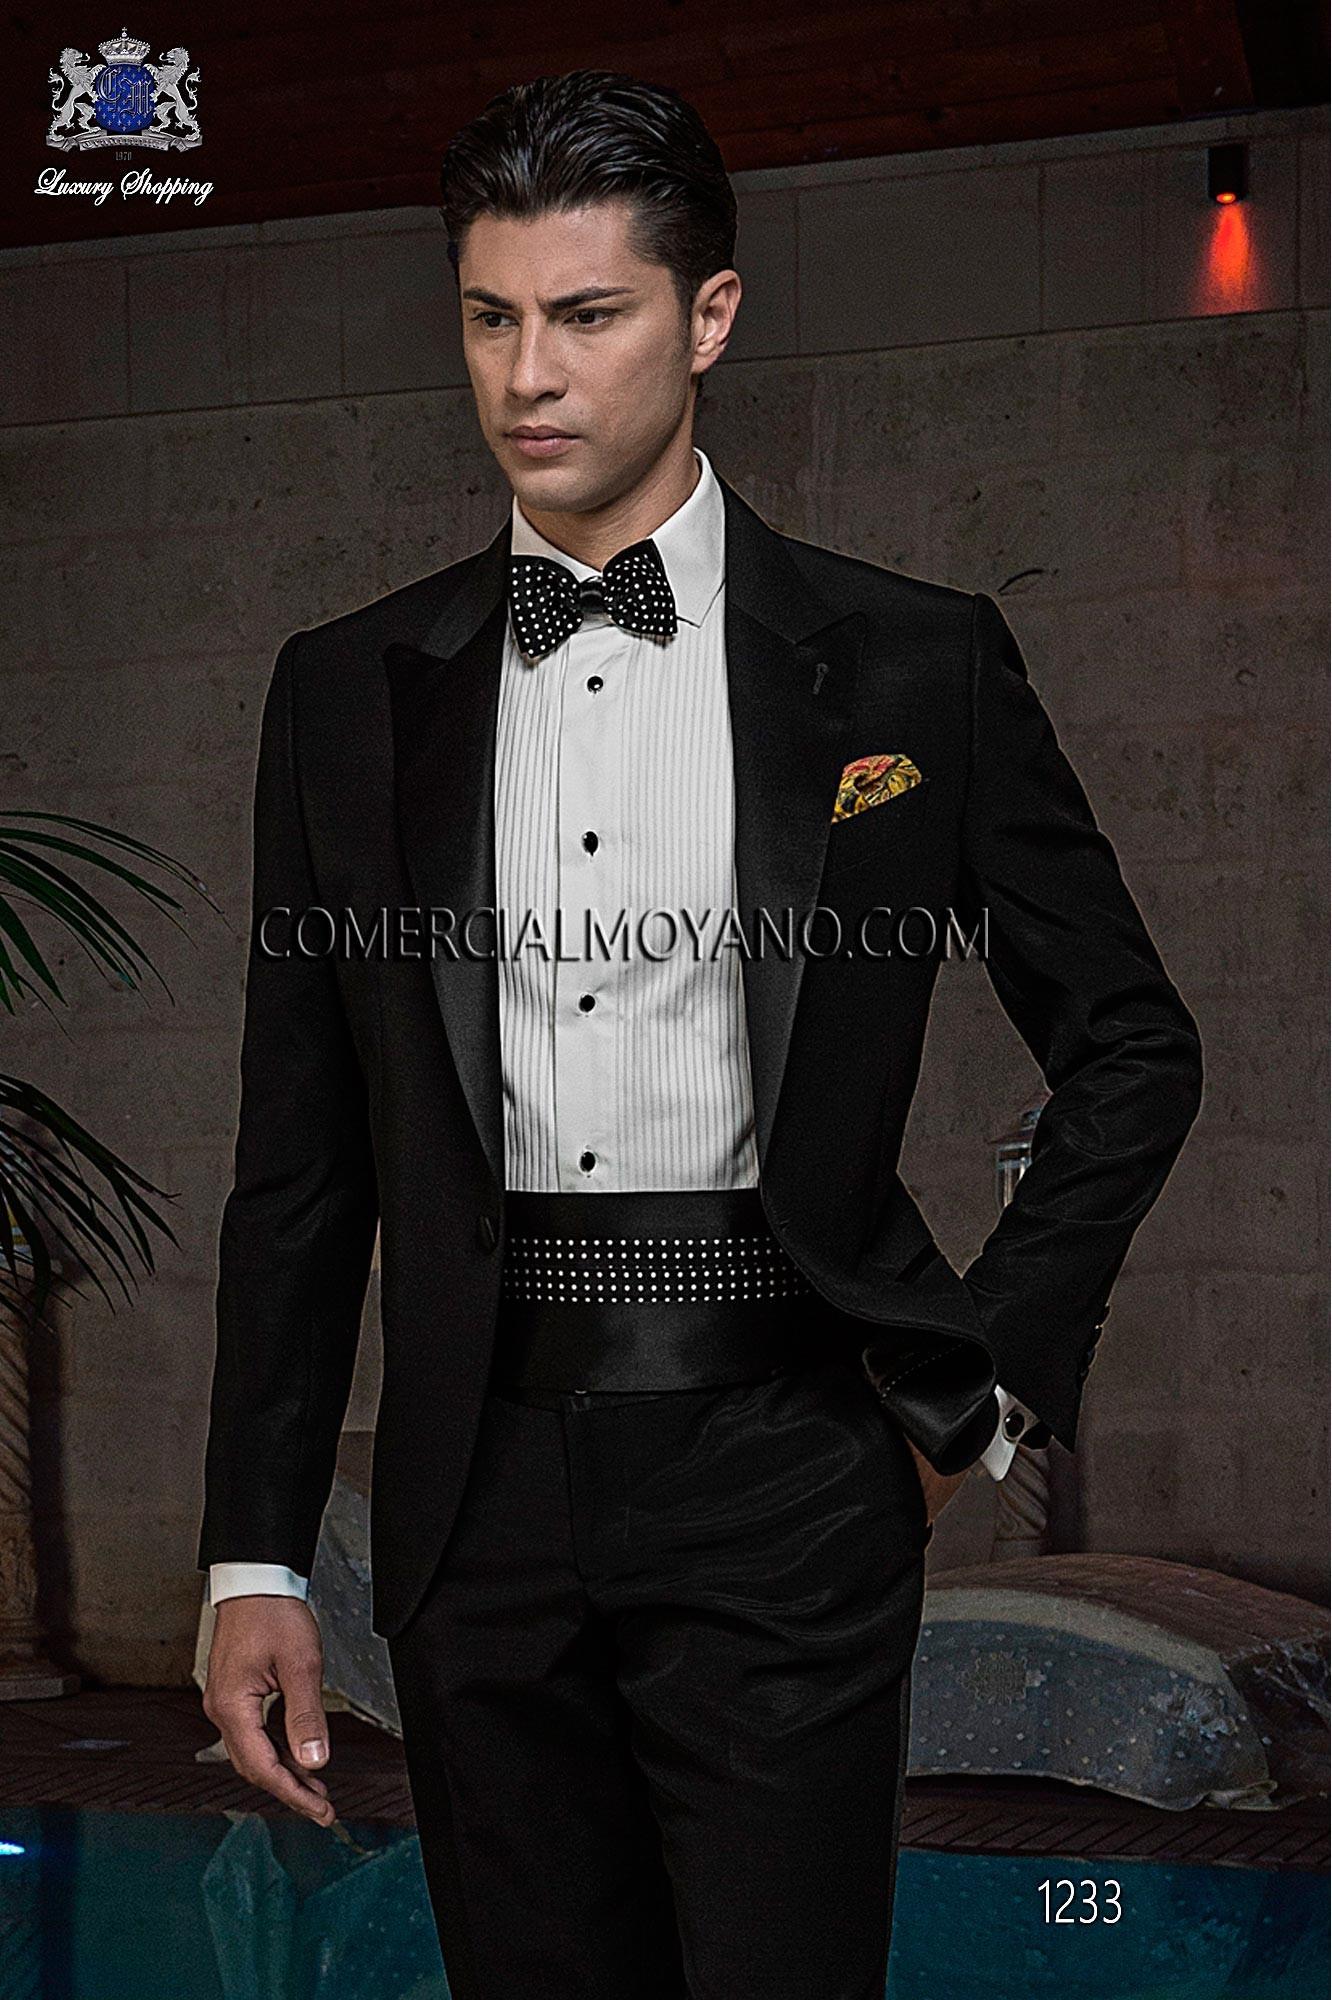 Christmas Dress code: Black tie wedding suits